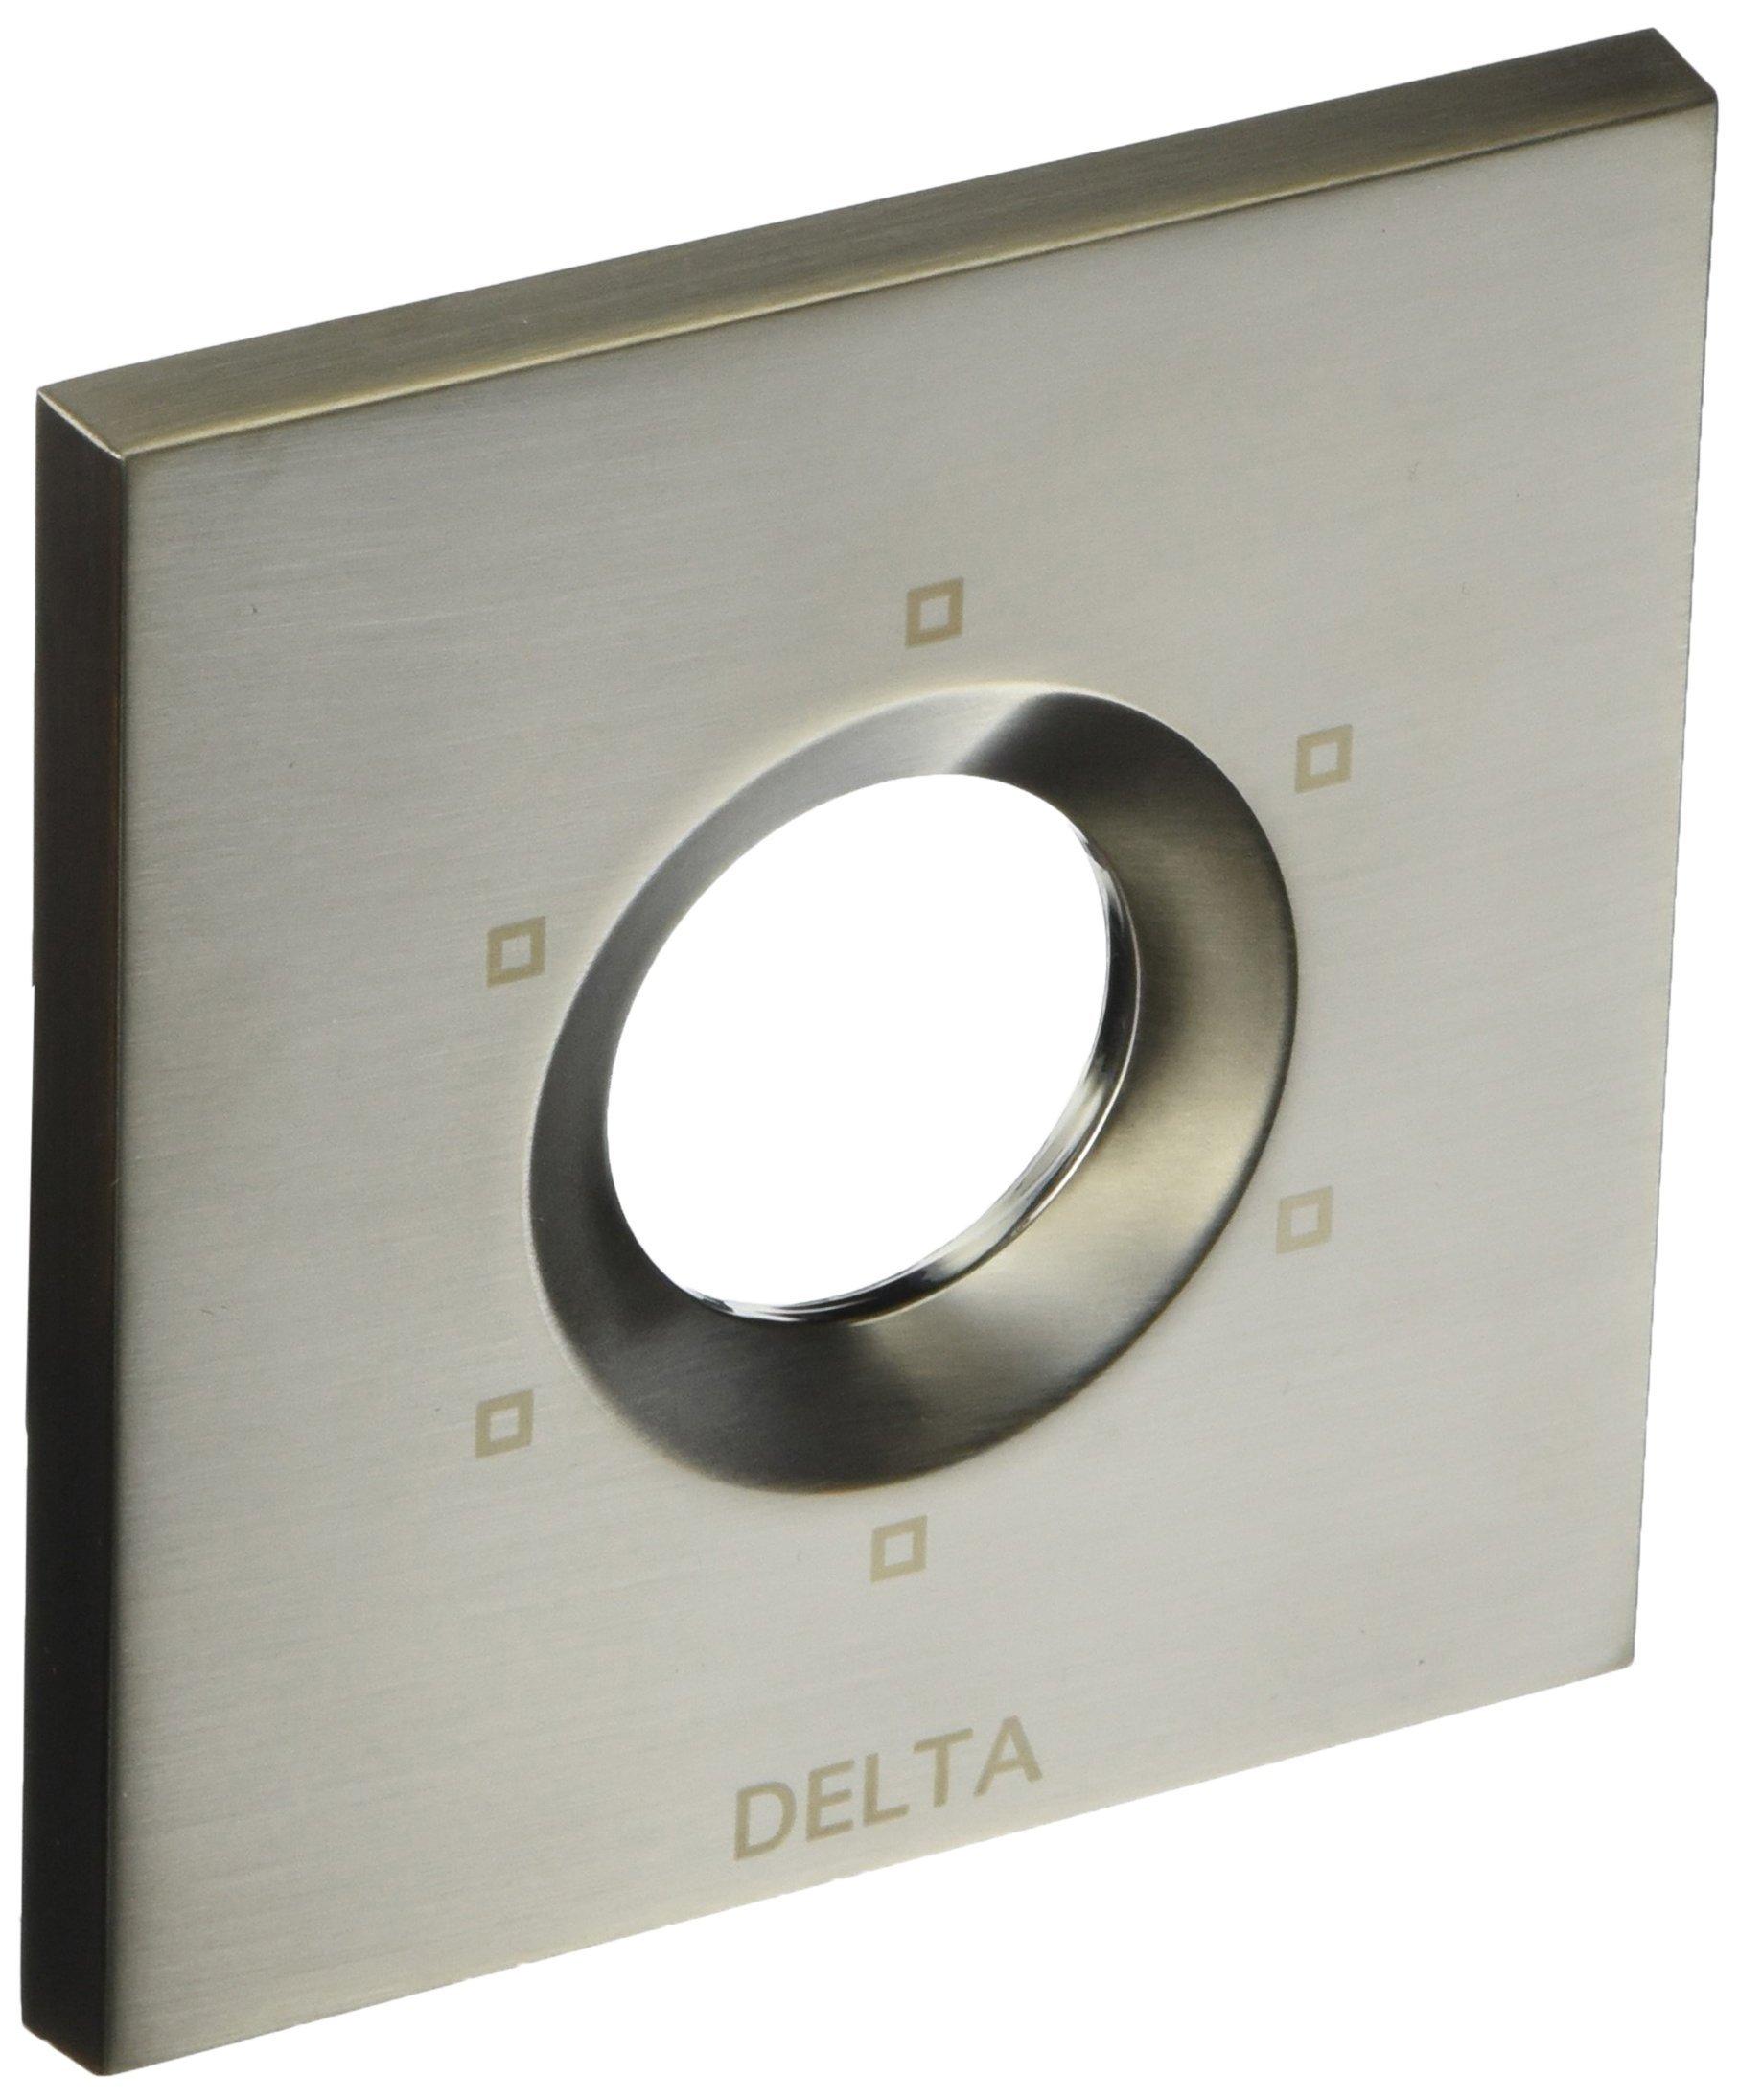 Delta RP62381SS Vero 6 Setting Escutcheon, Stainless